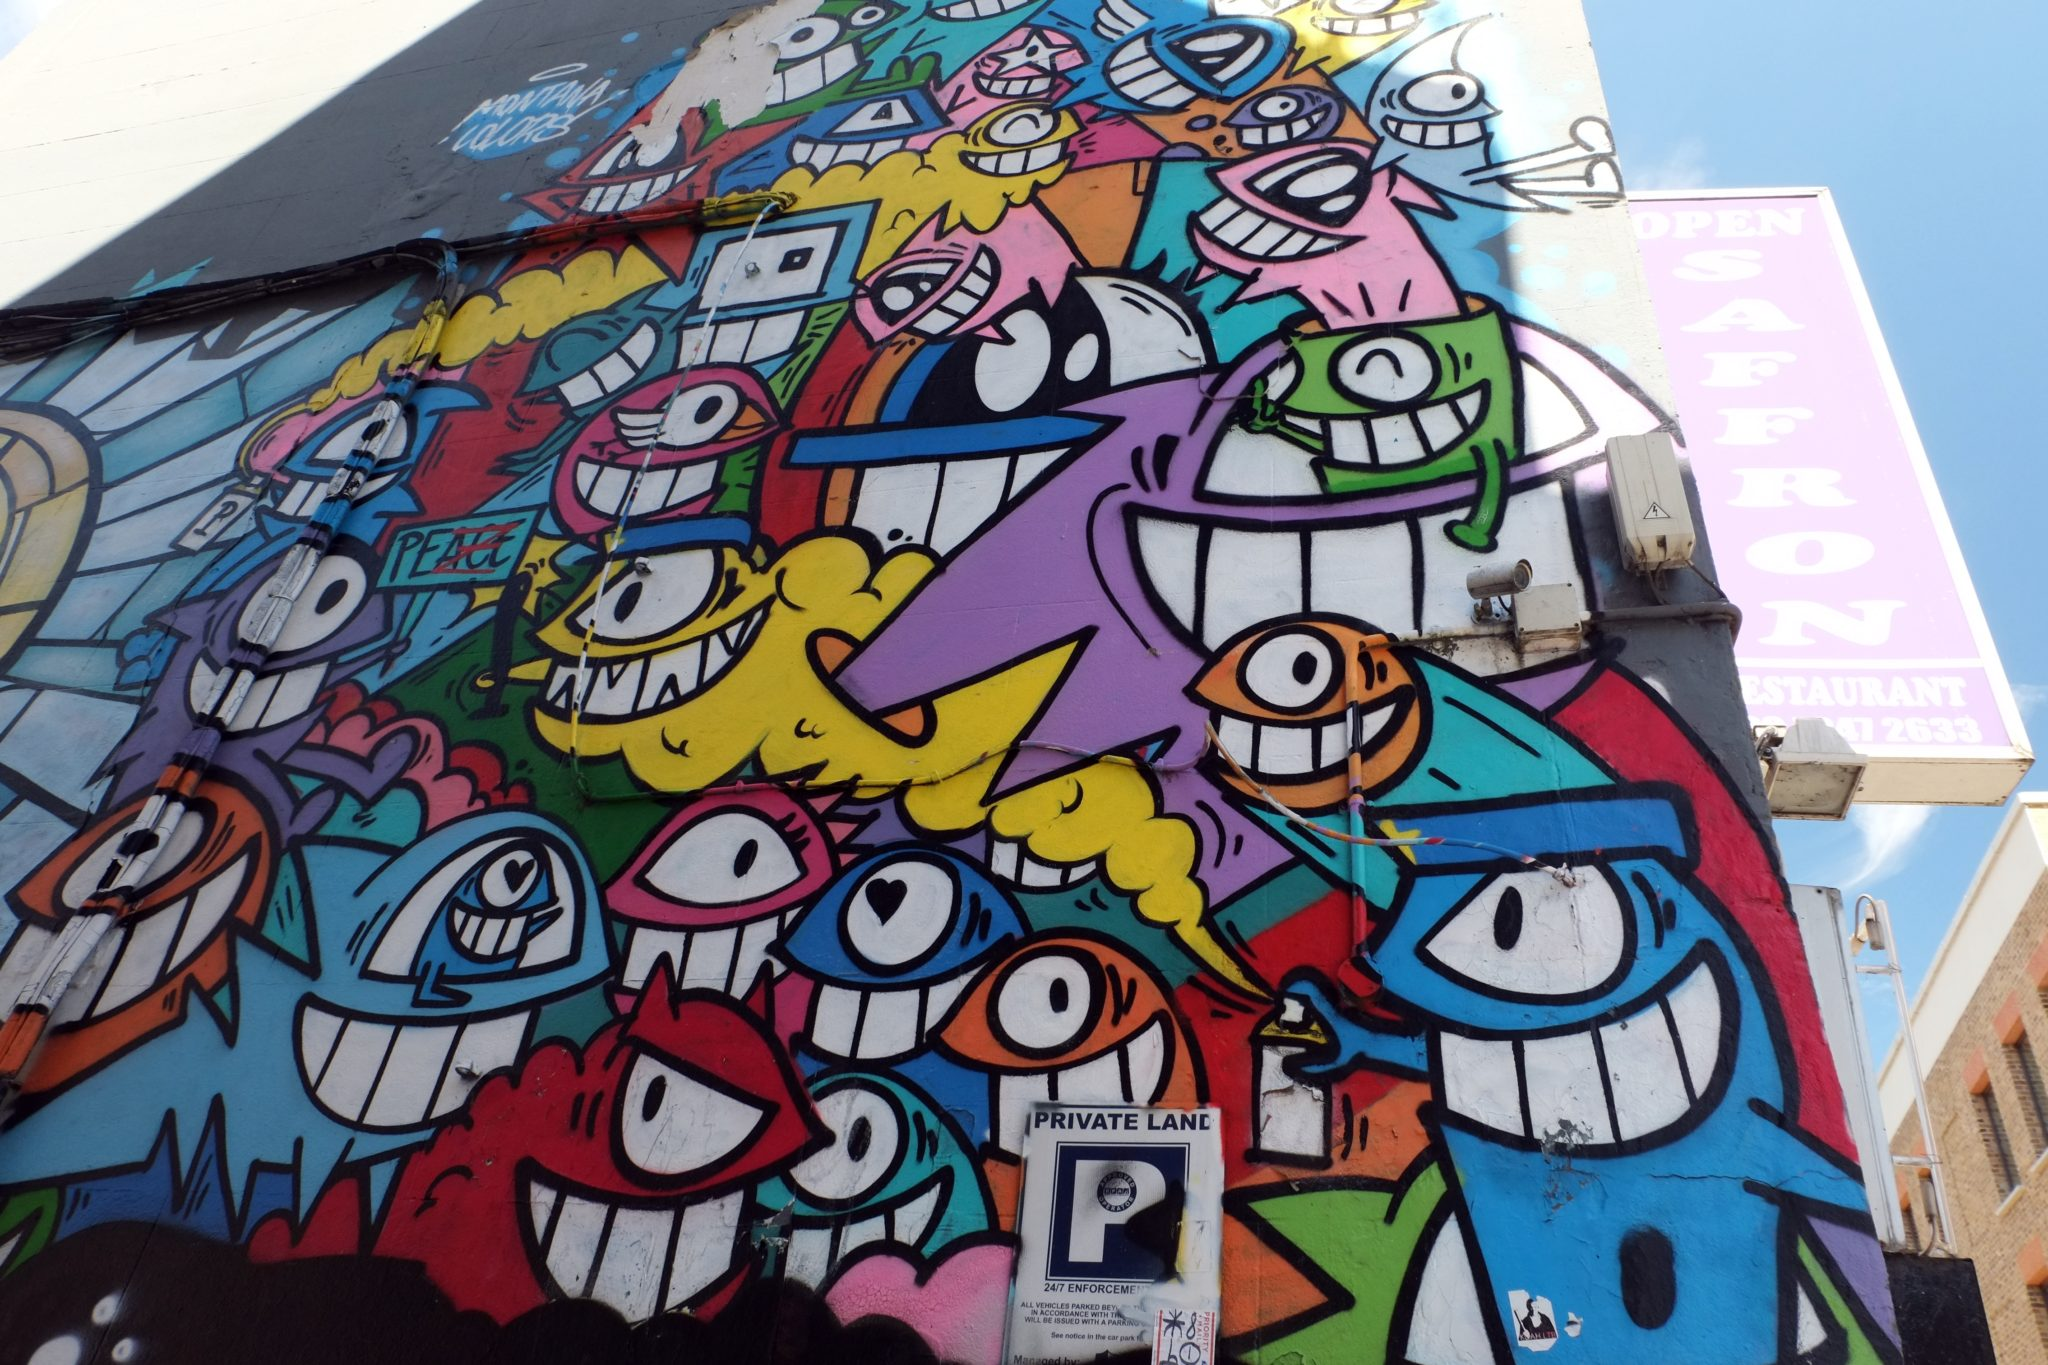 Street art in London, Brick Lane